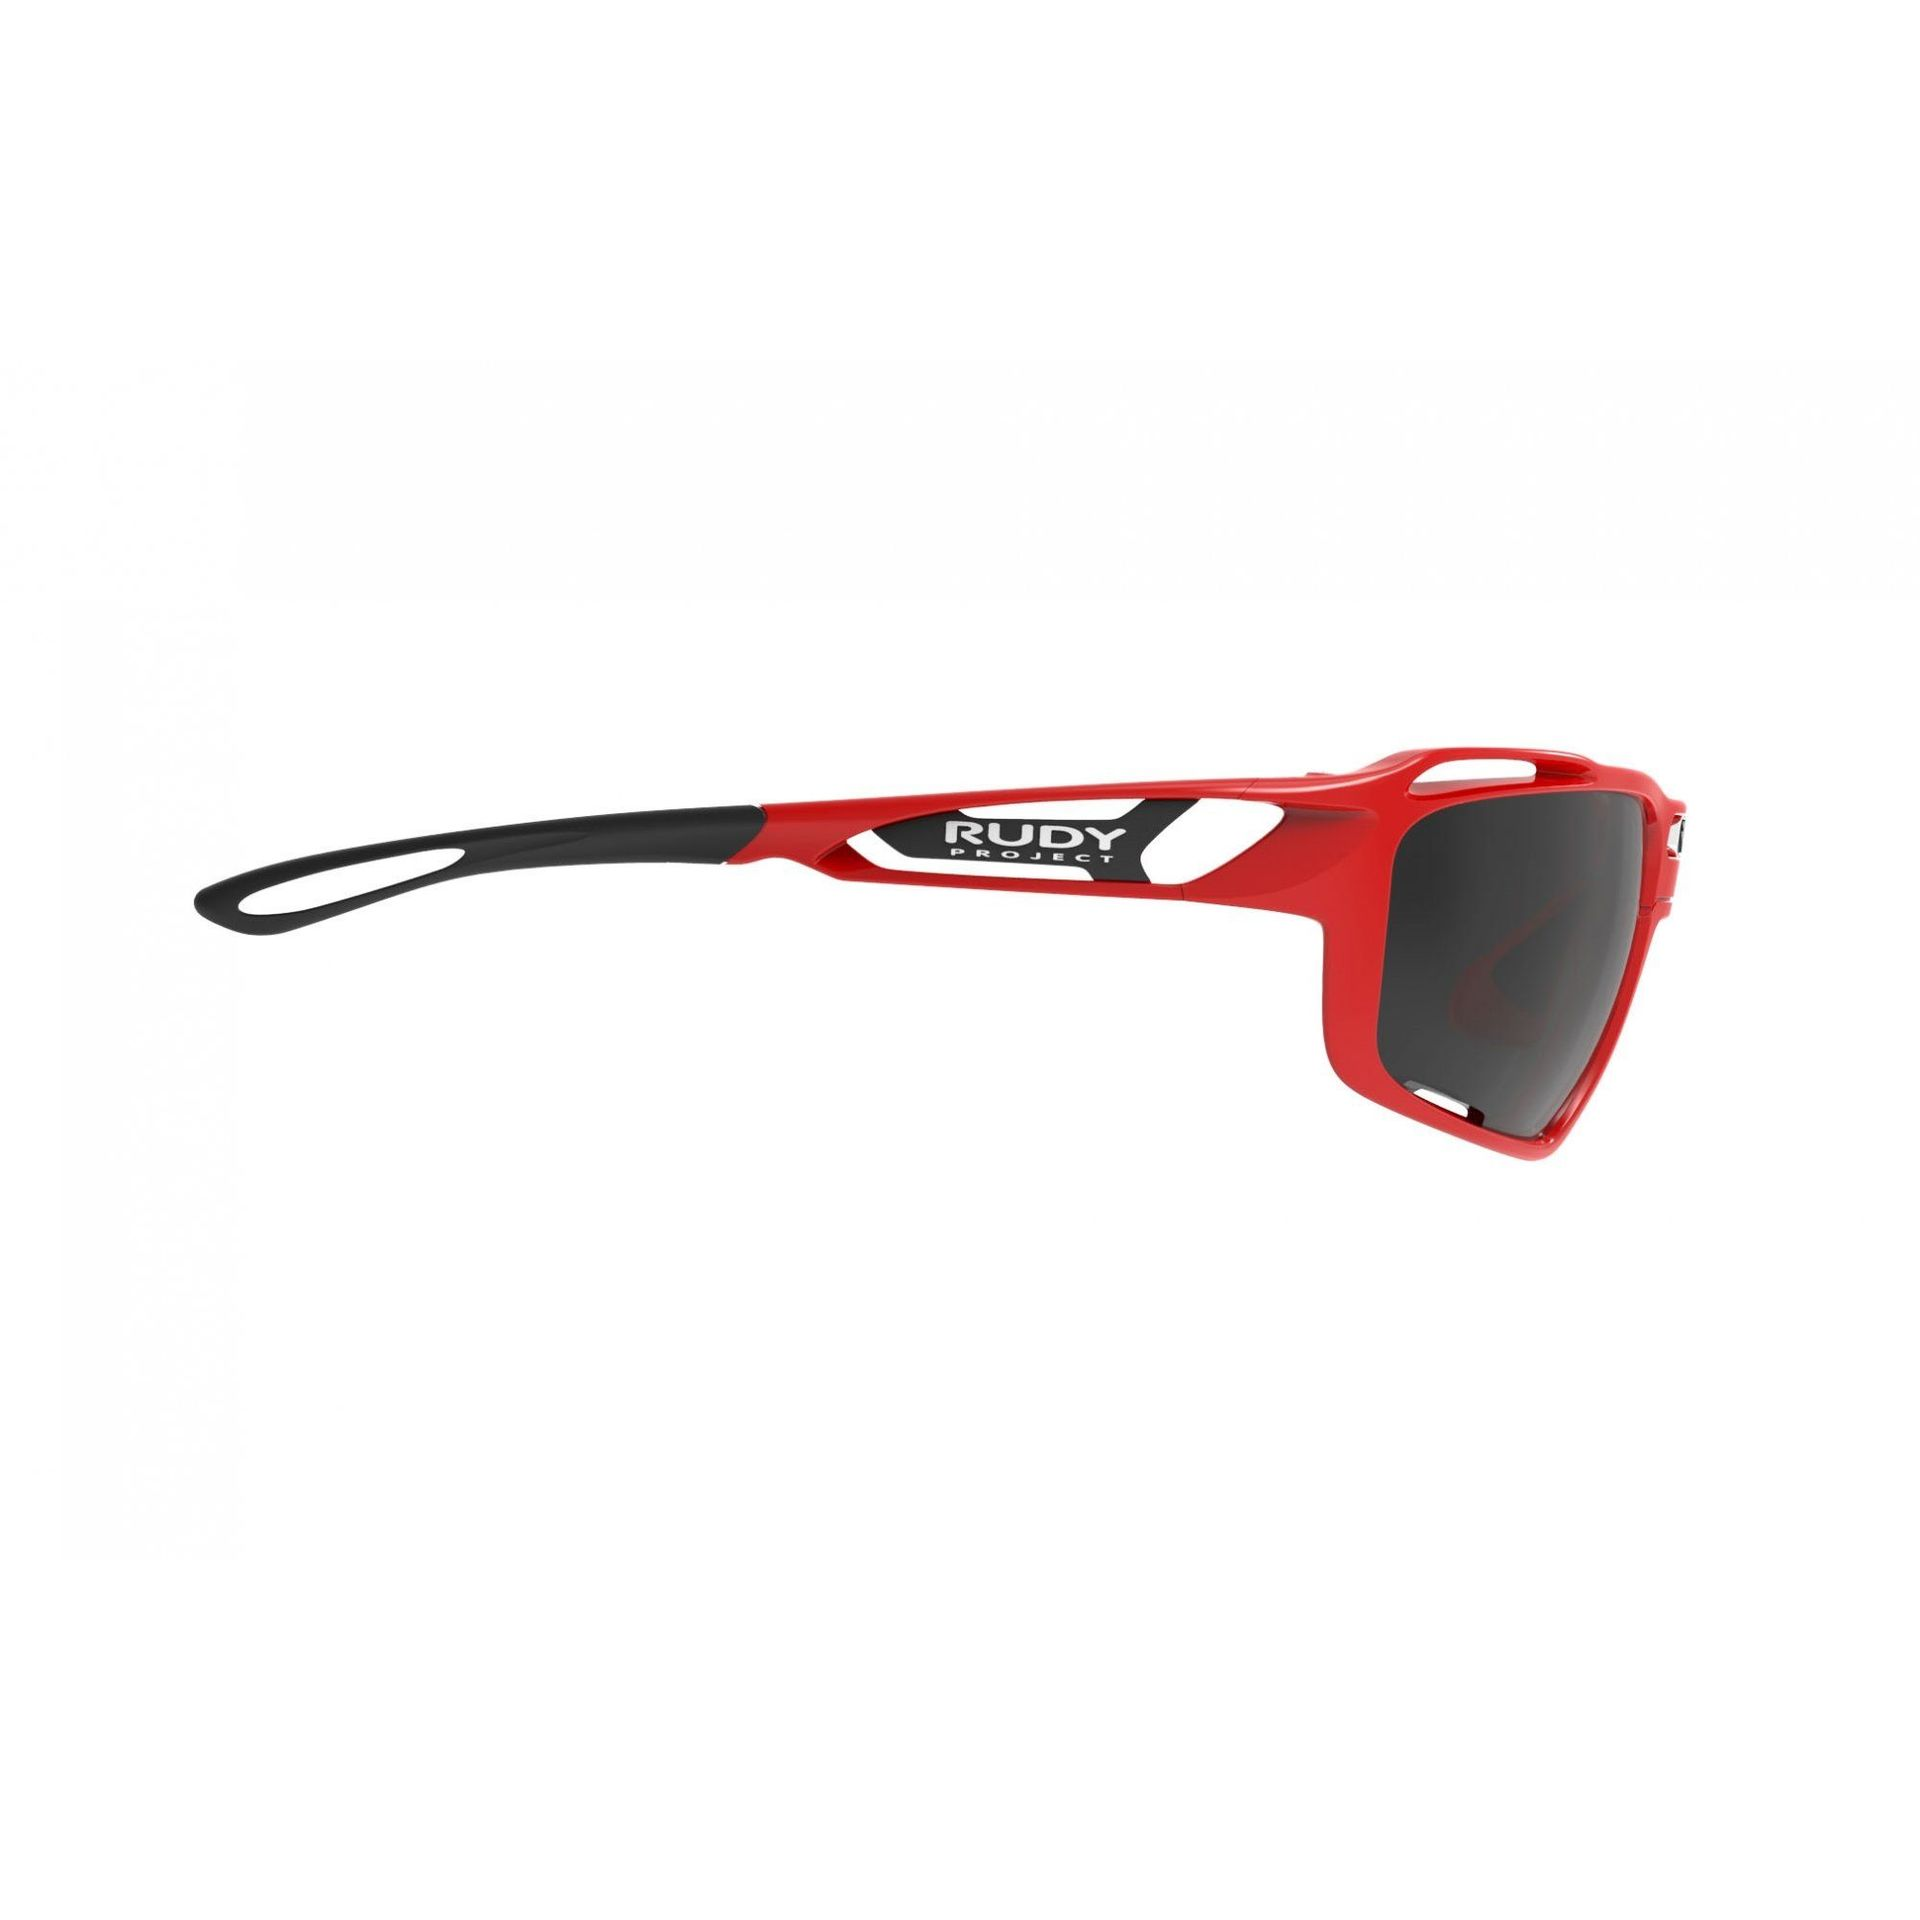 OKULARY RUDY PROJECT SINTRYX FIRE RED + SMOKE|TRANS SP491045 4